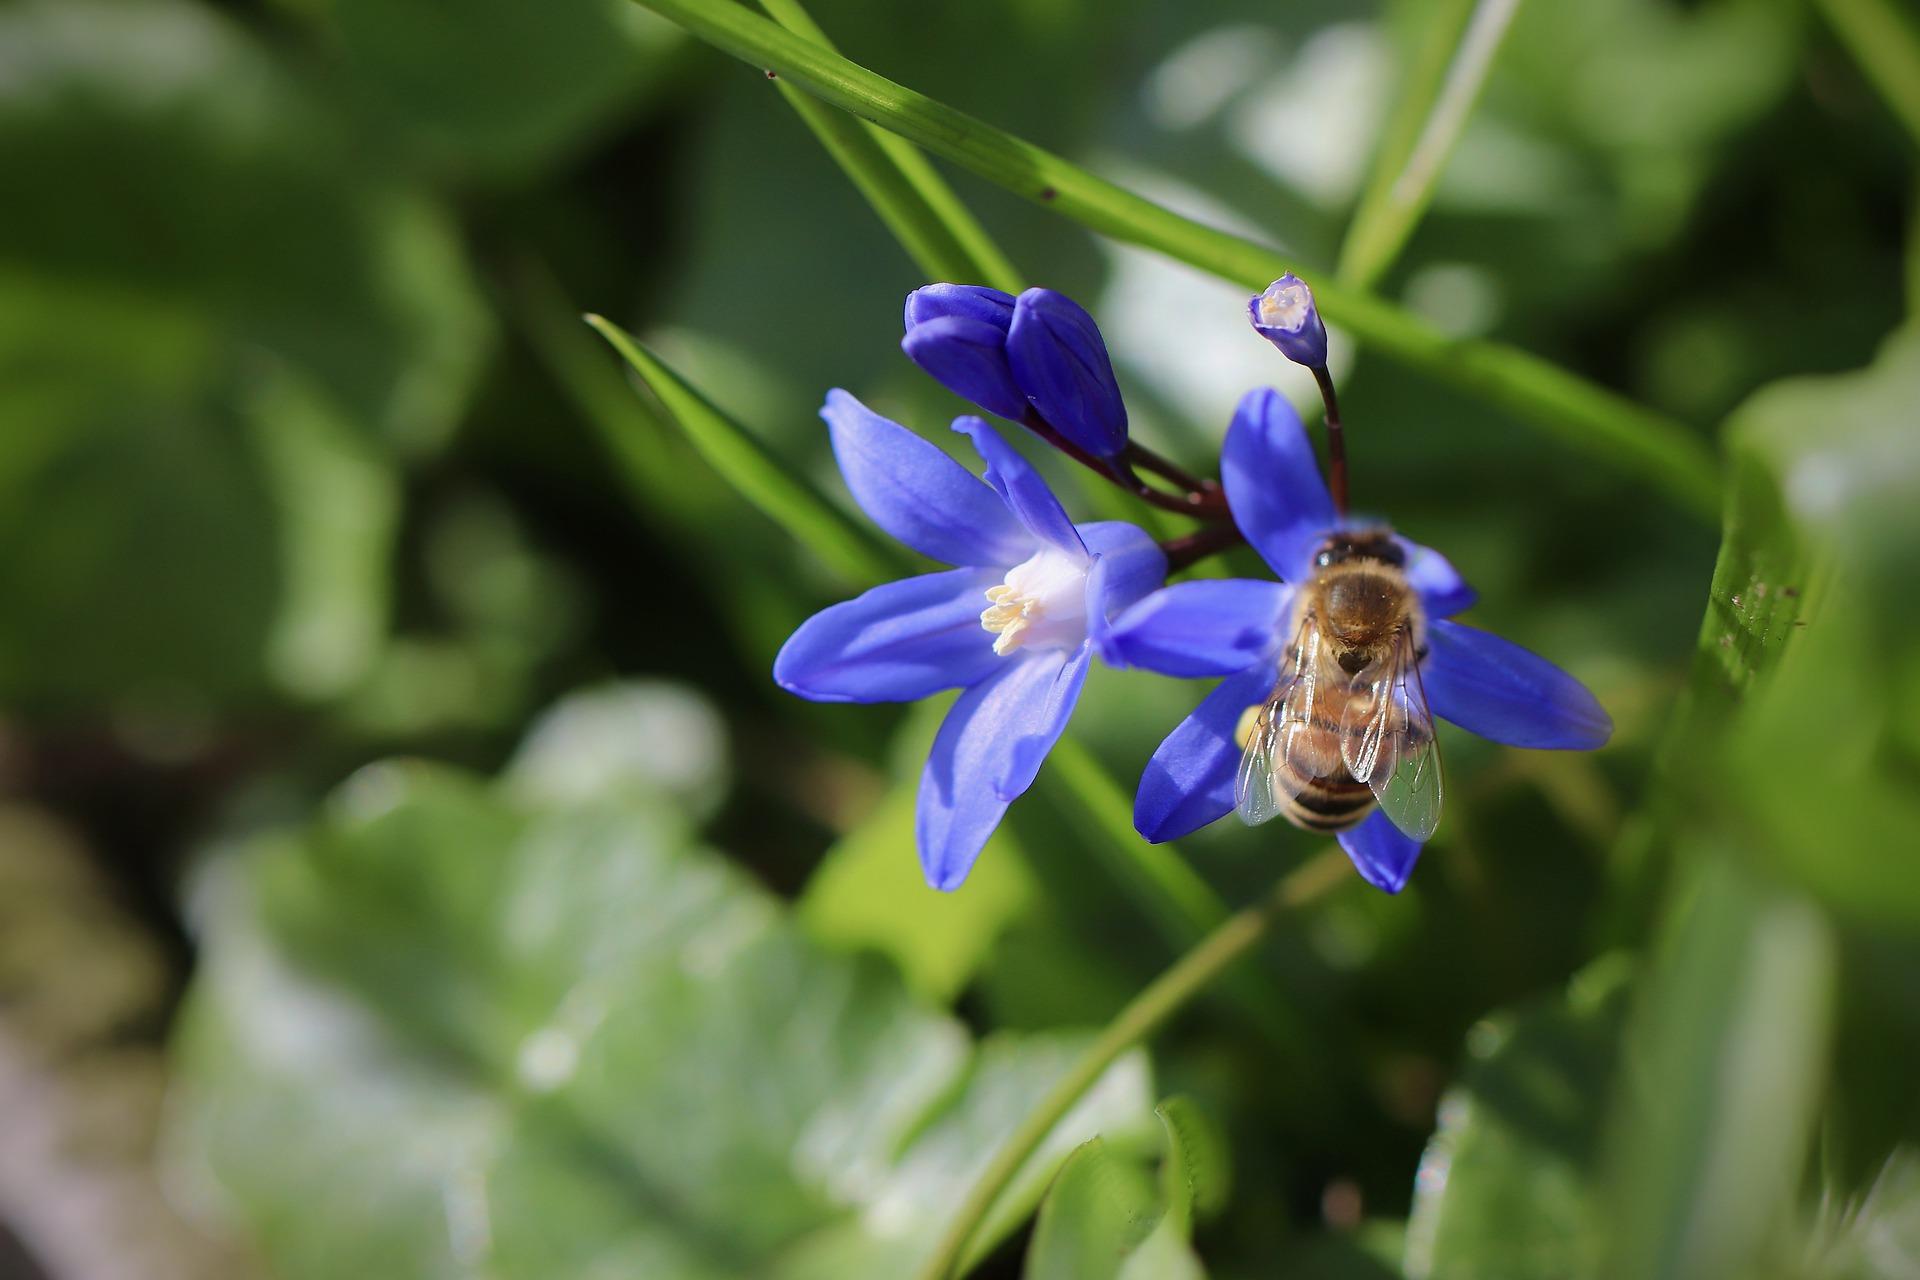 Pflanze des Monats: Blausternchen - funkelnder Frühlingsbote